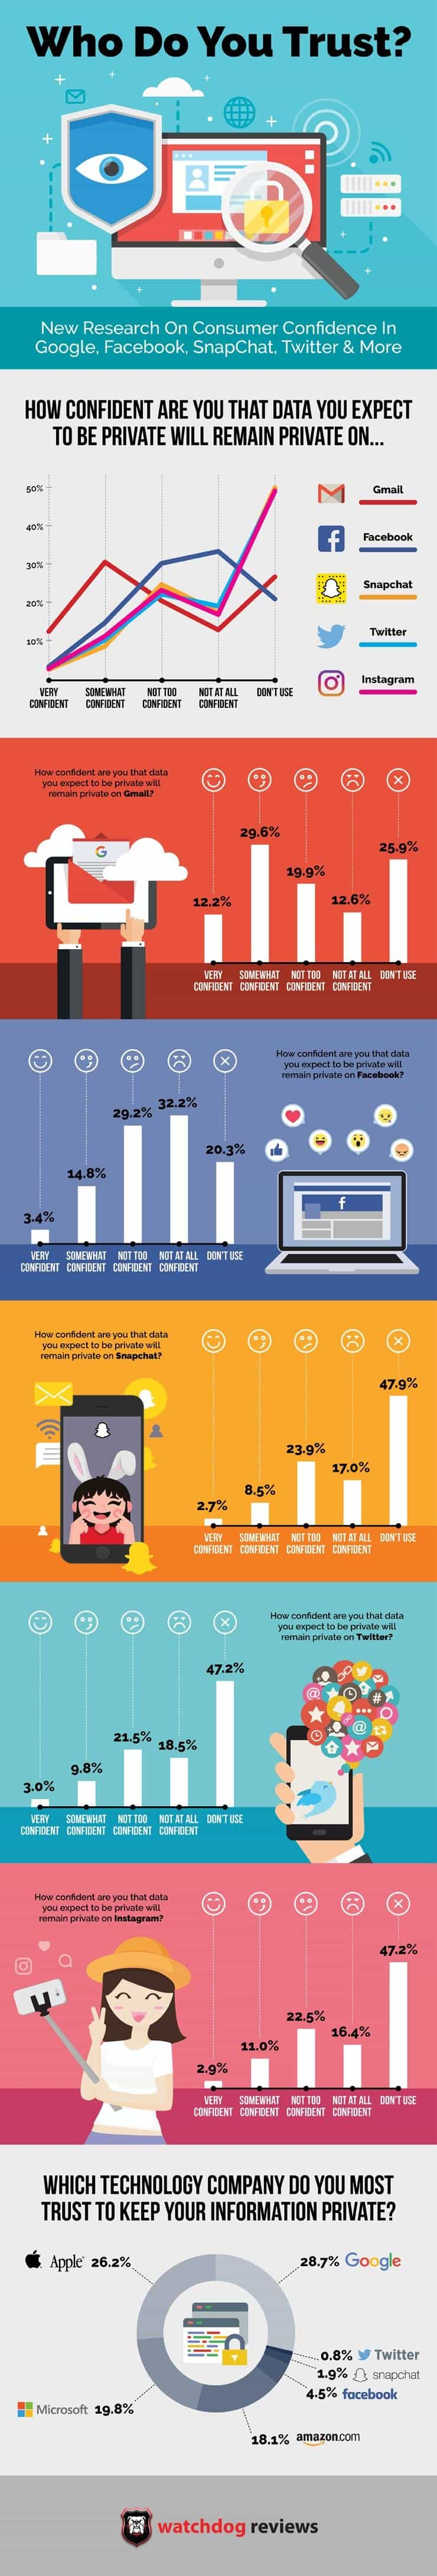 Digital Privacy Is Still a Big Issue